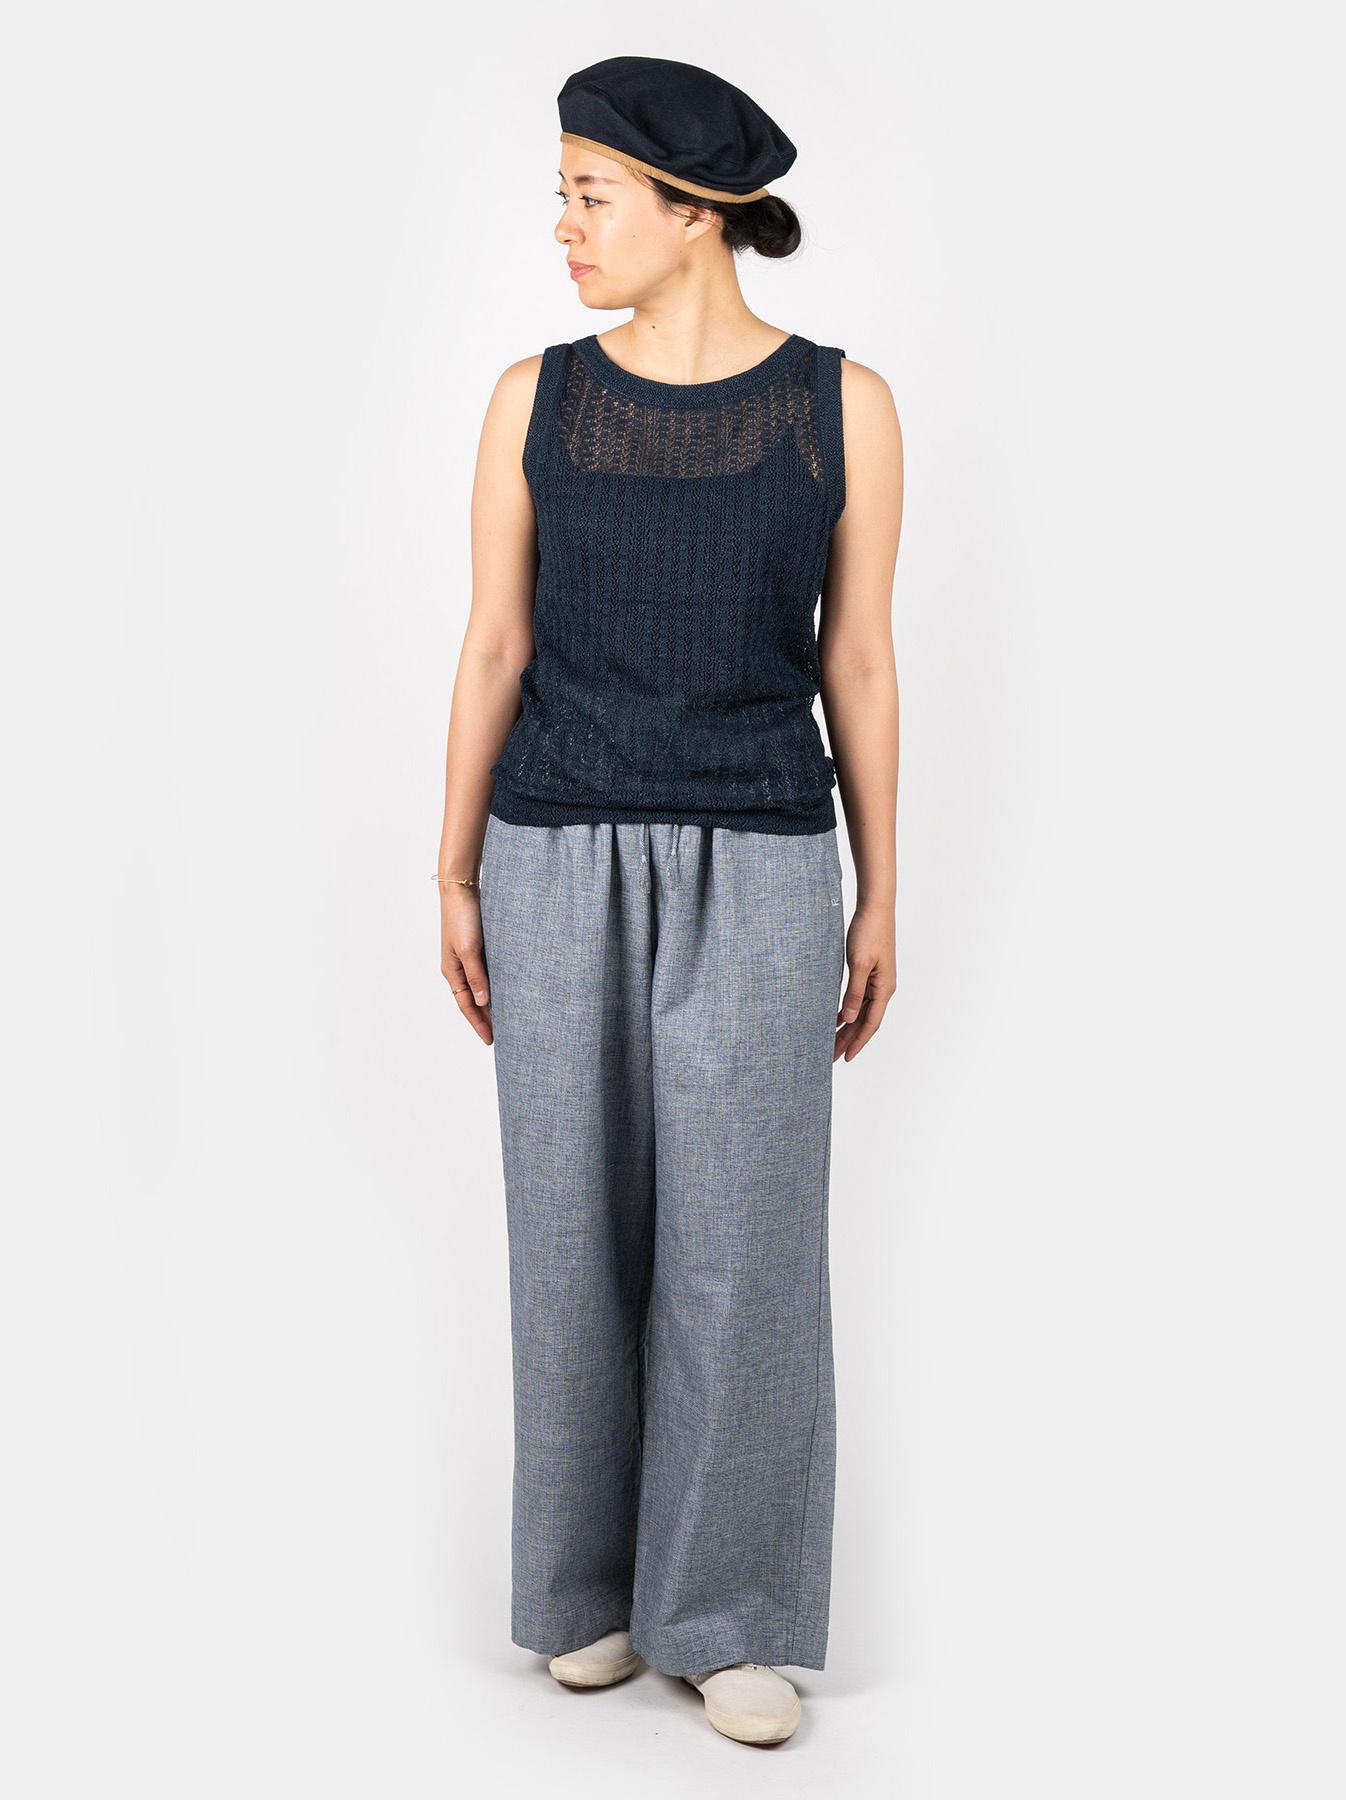 WH Indigo Gima Knit Lace Sleeveless Top-2